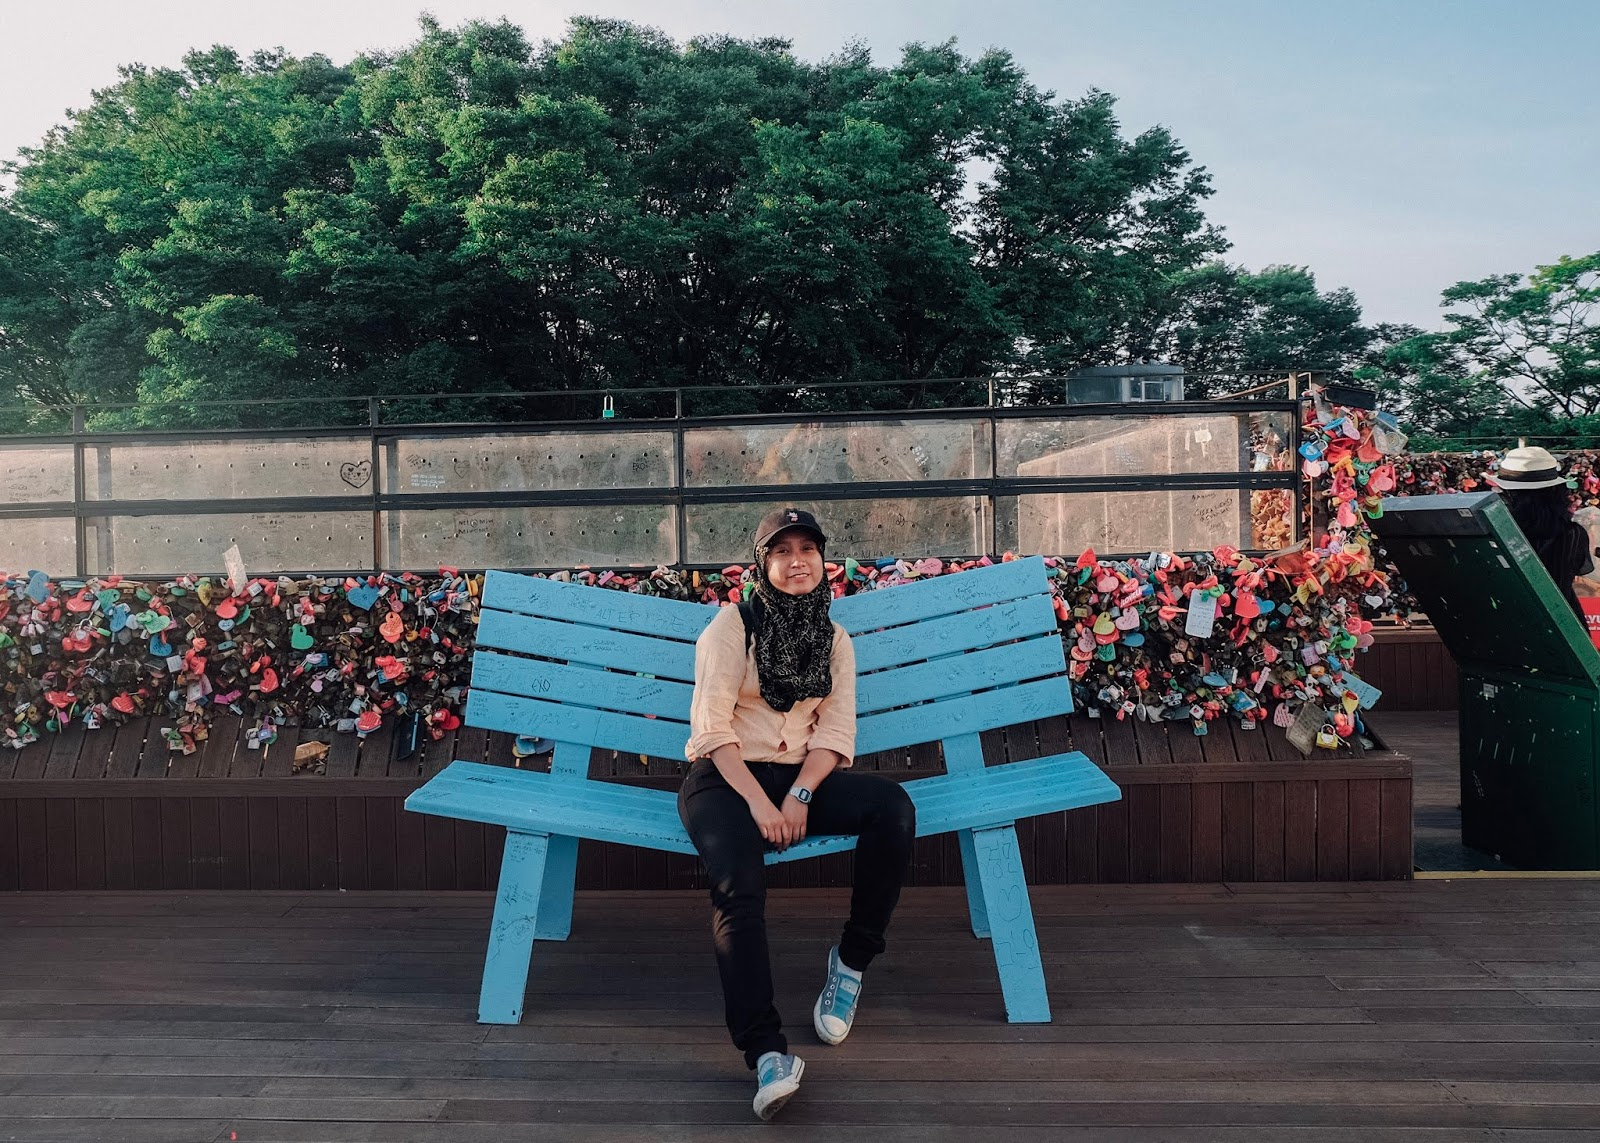 Namsan Tower Seoul Korea  Curitan Aqalili